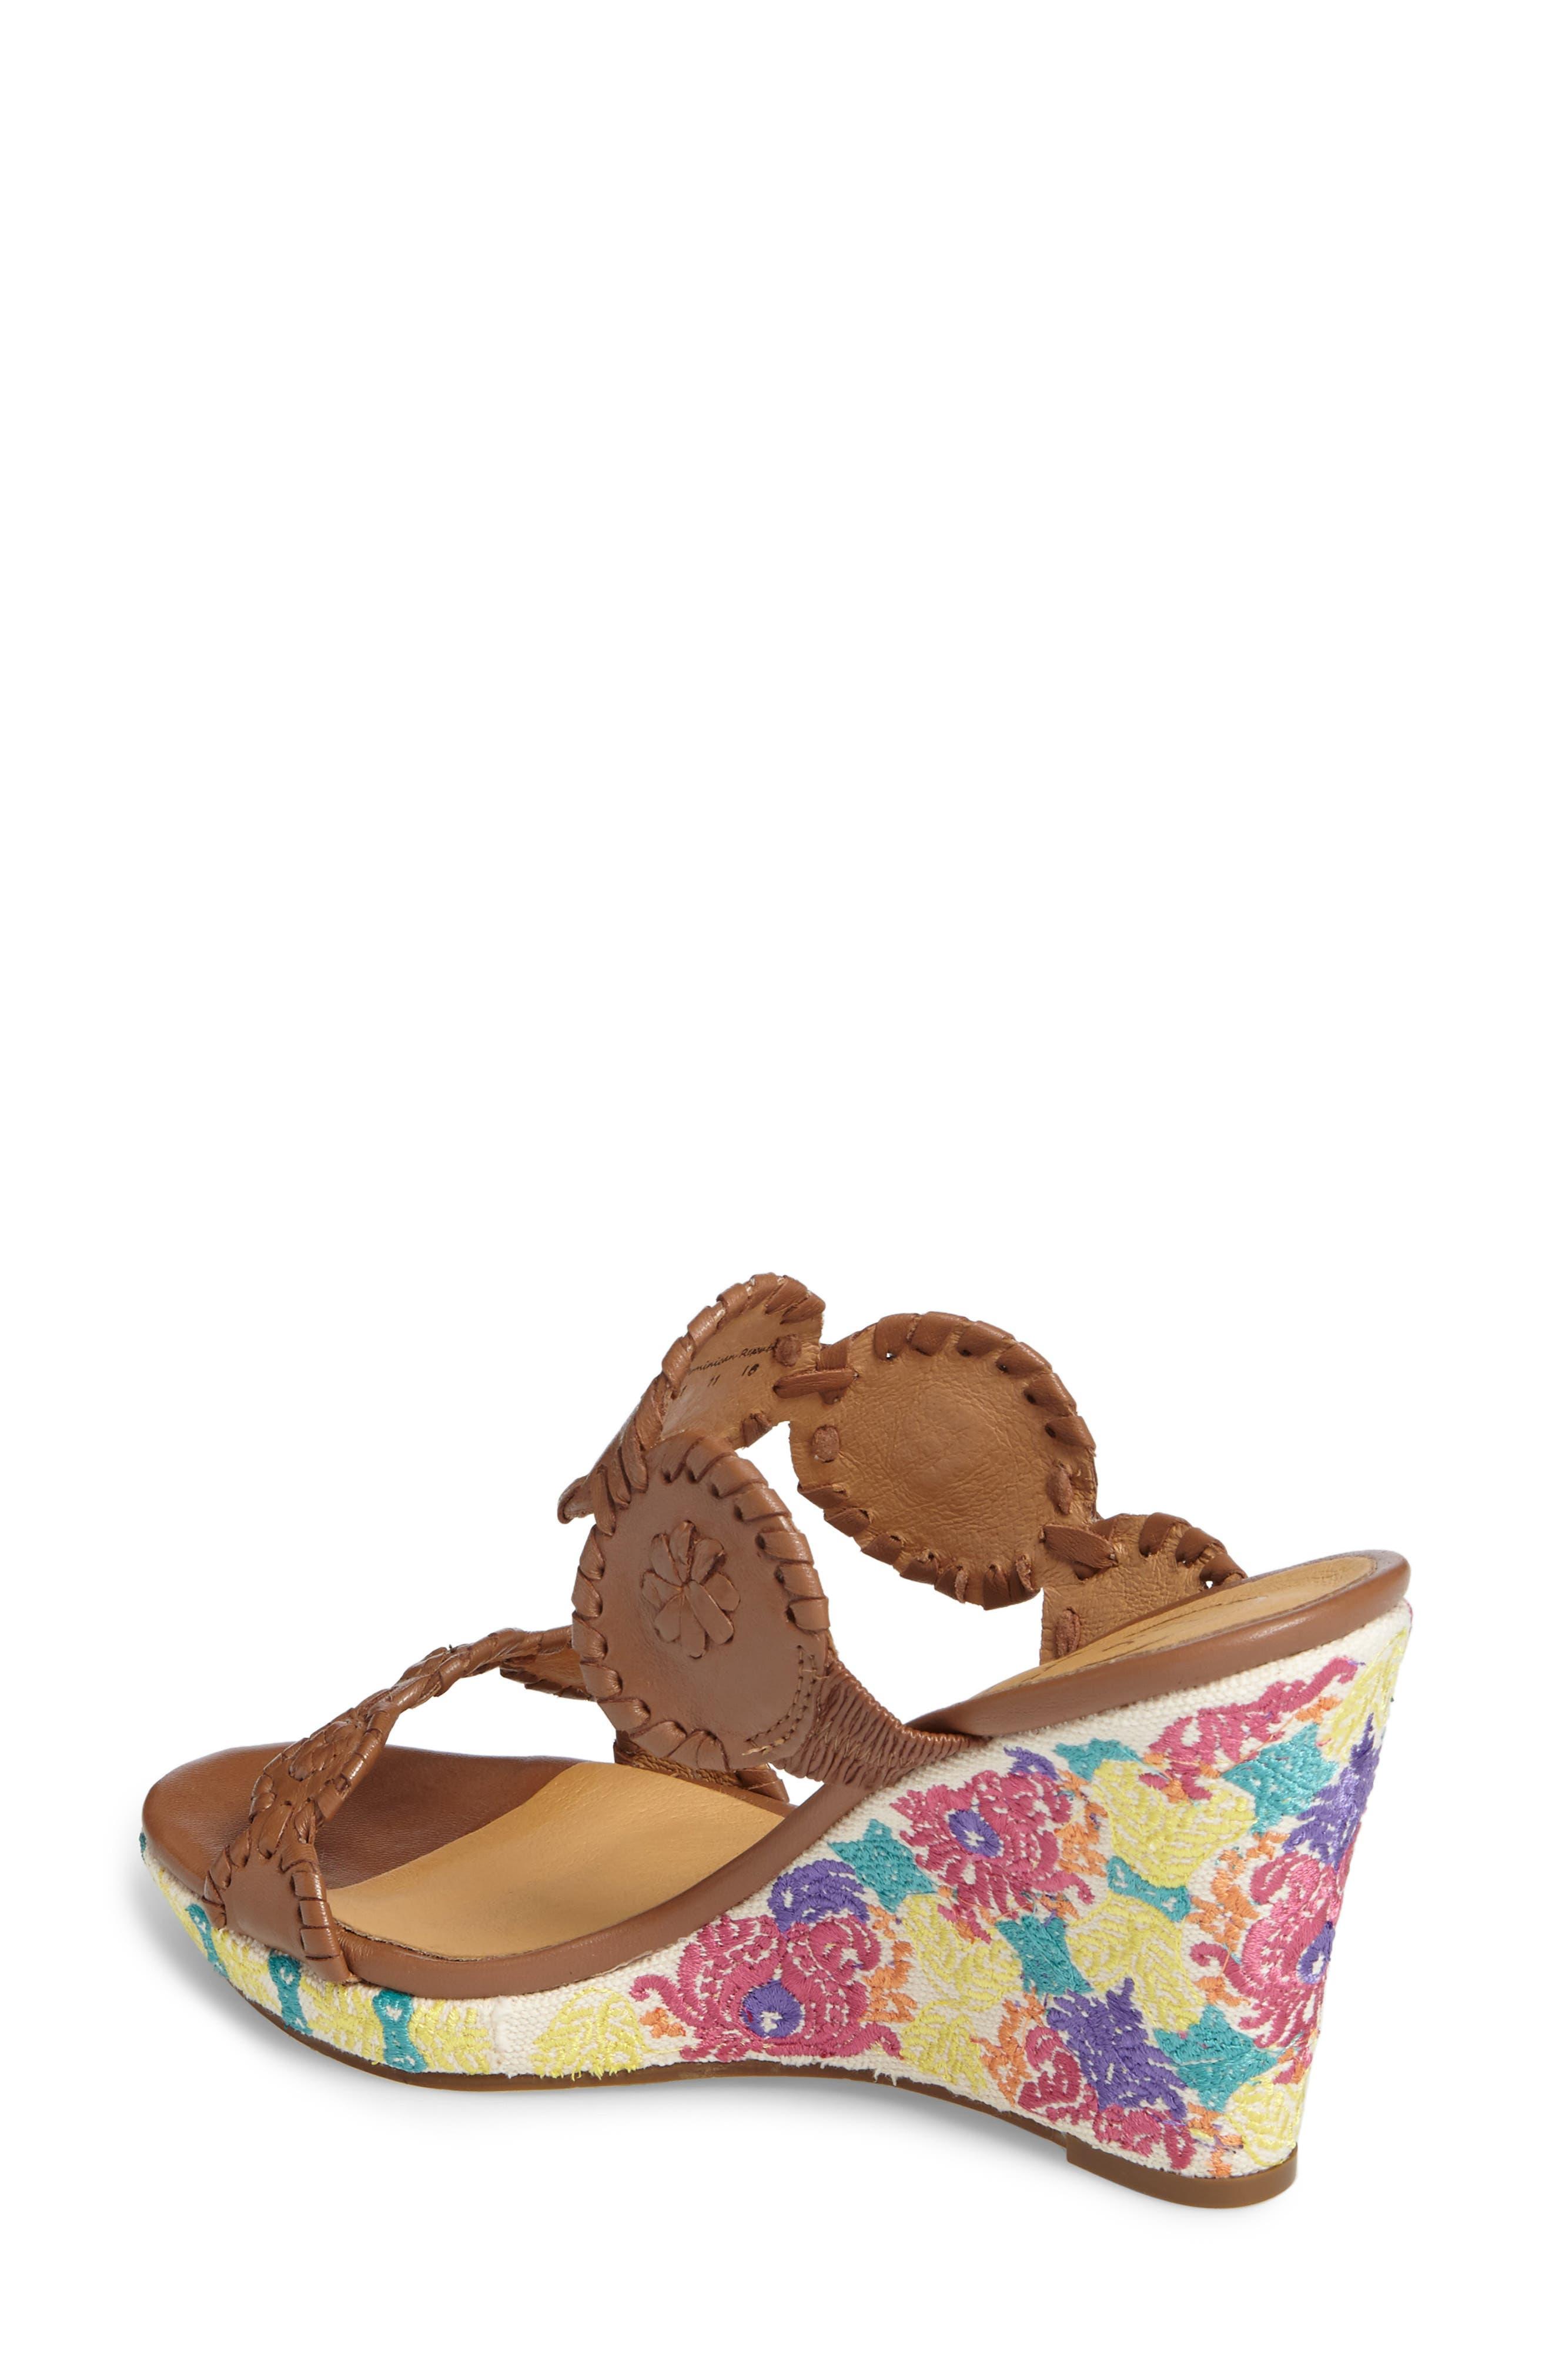 Livvy Wedge Slide Sandal,                             Alternate thumbnail 2, color,                             Cognac Leather